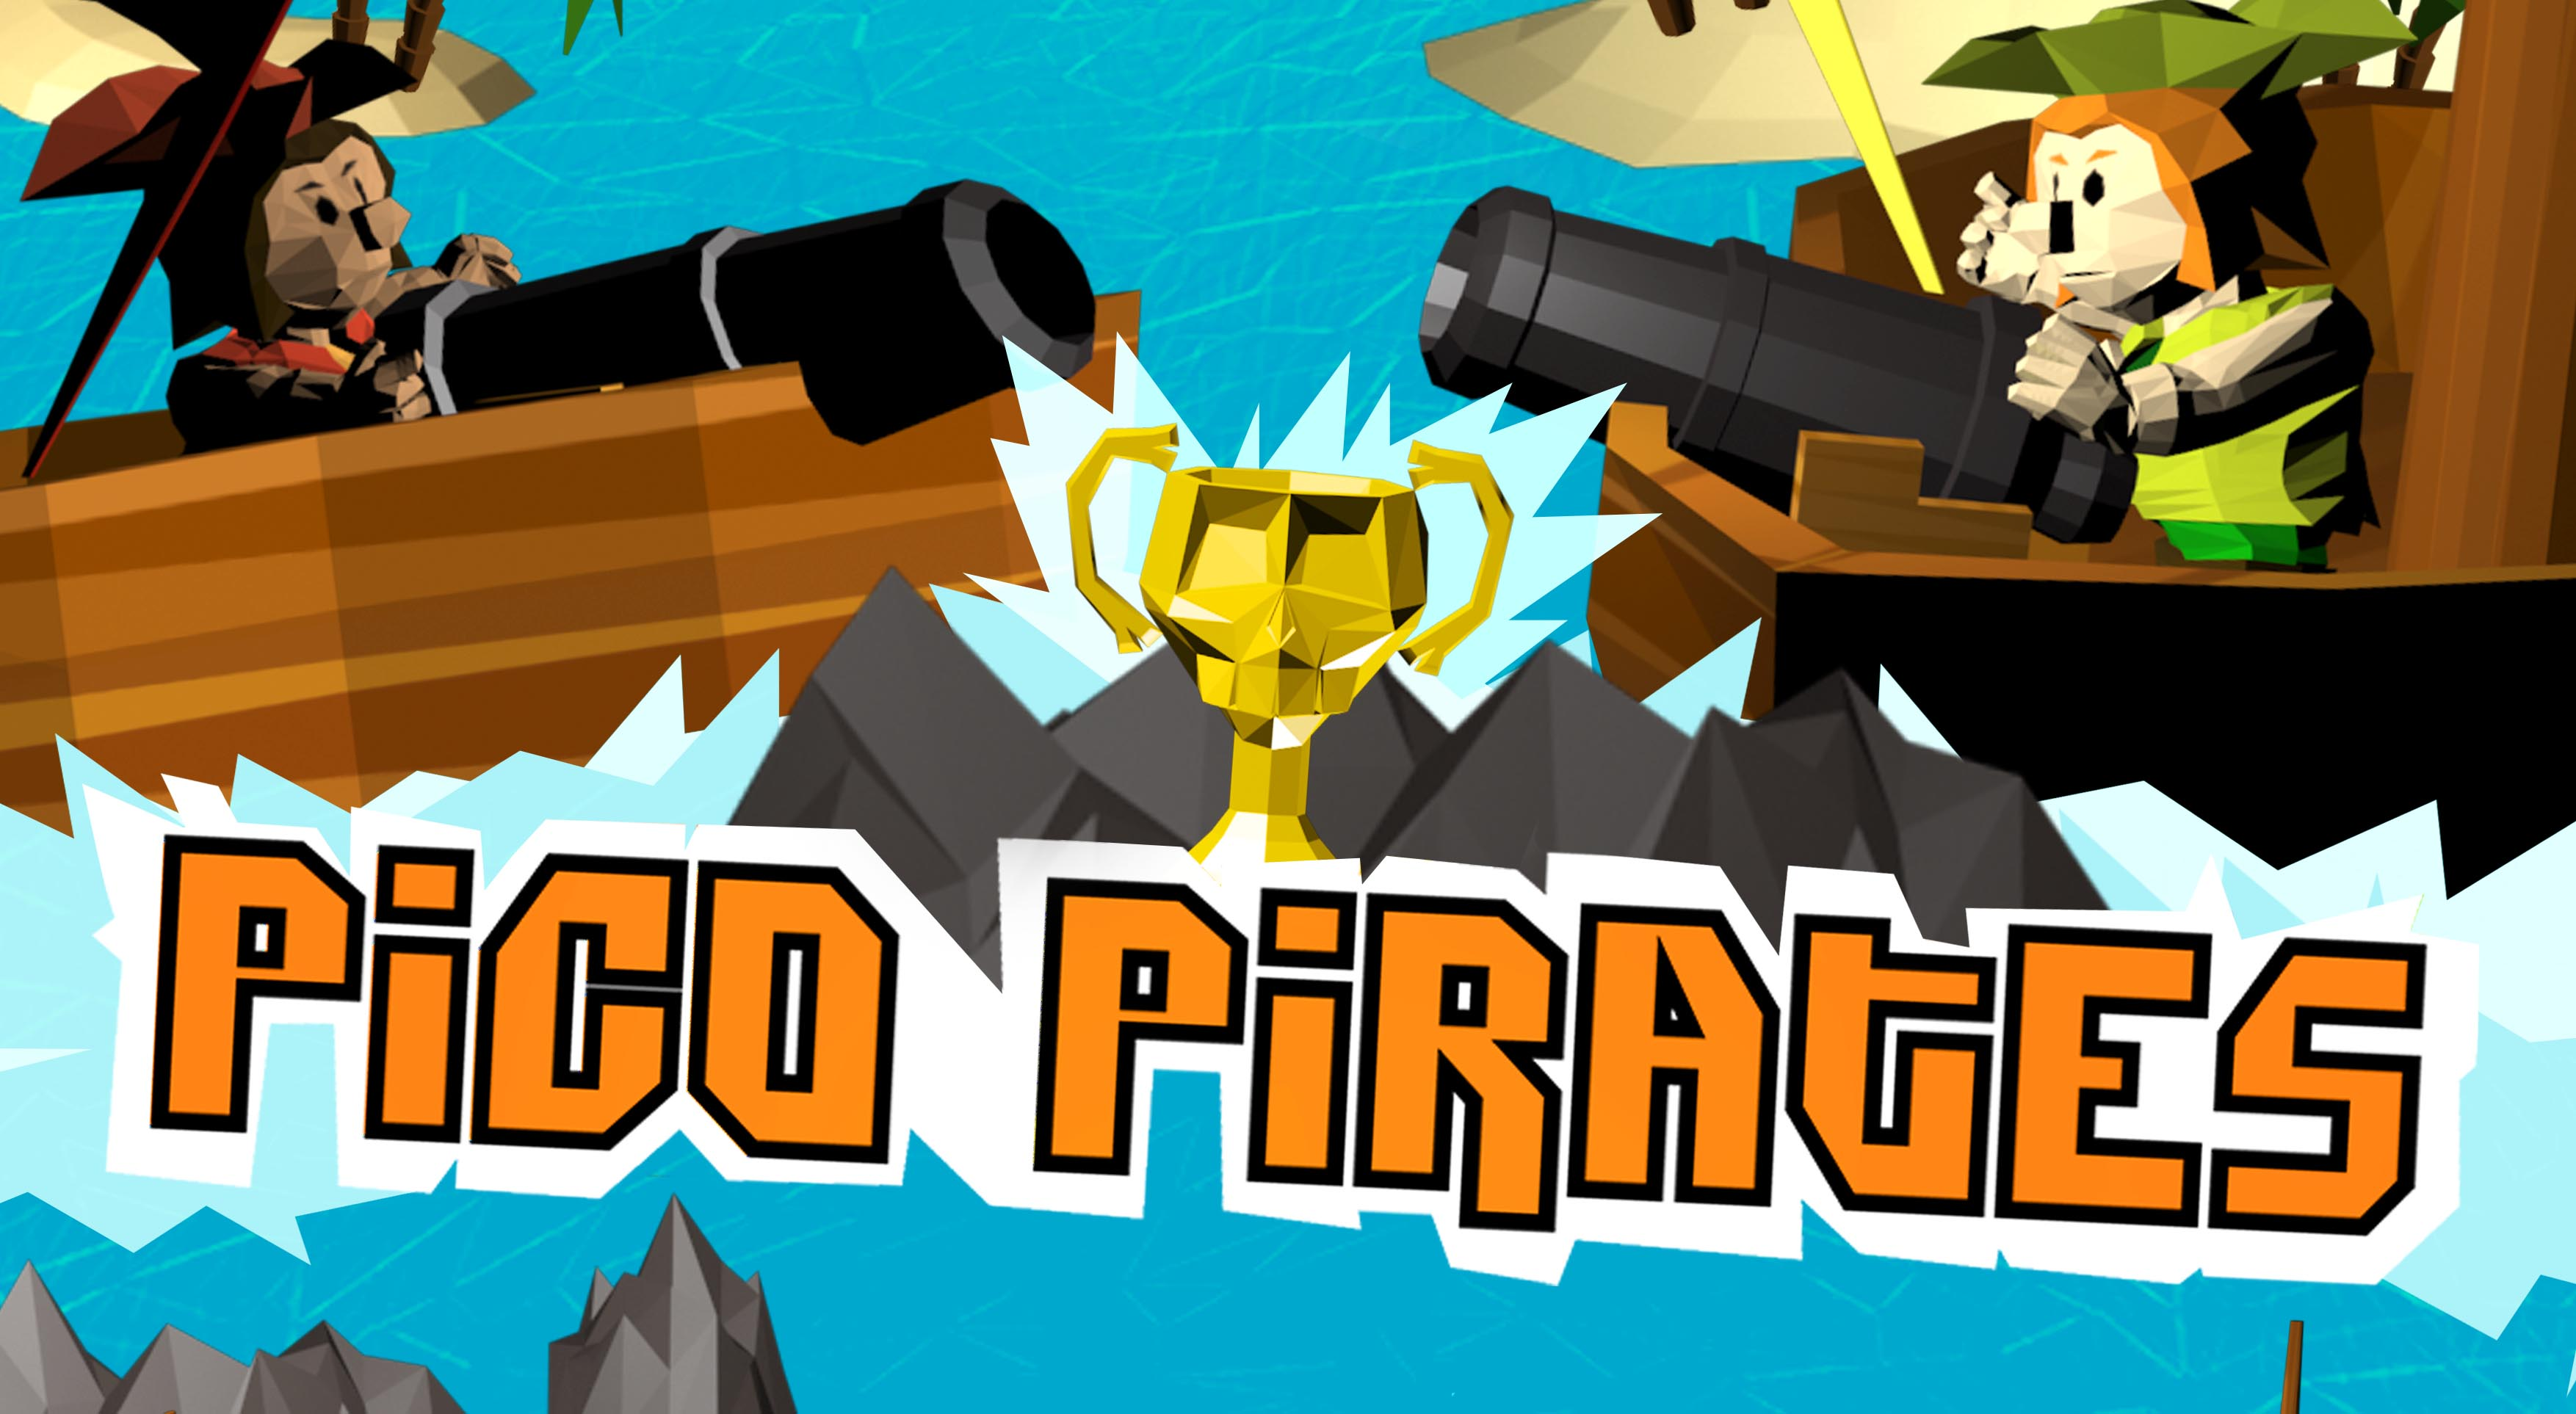 Pico Pirates